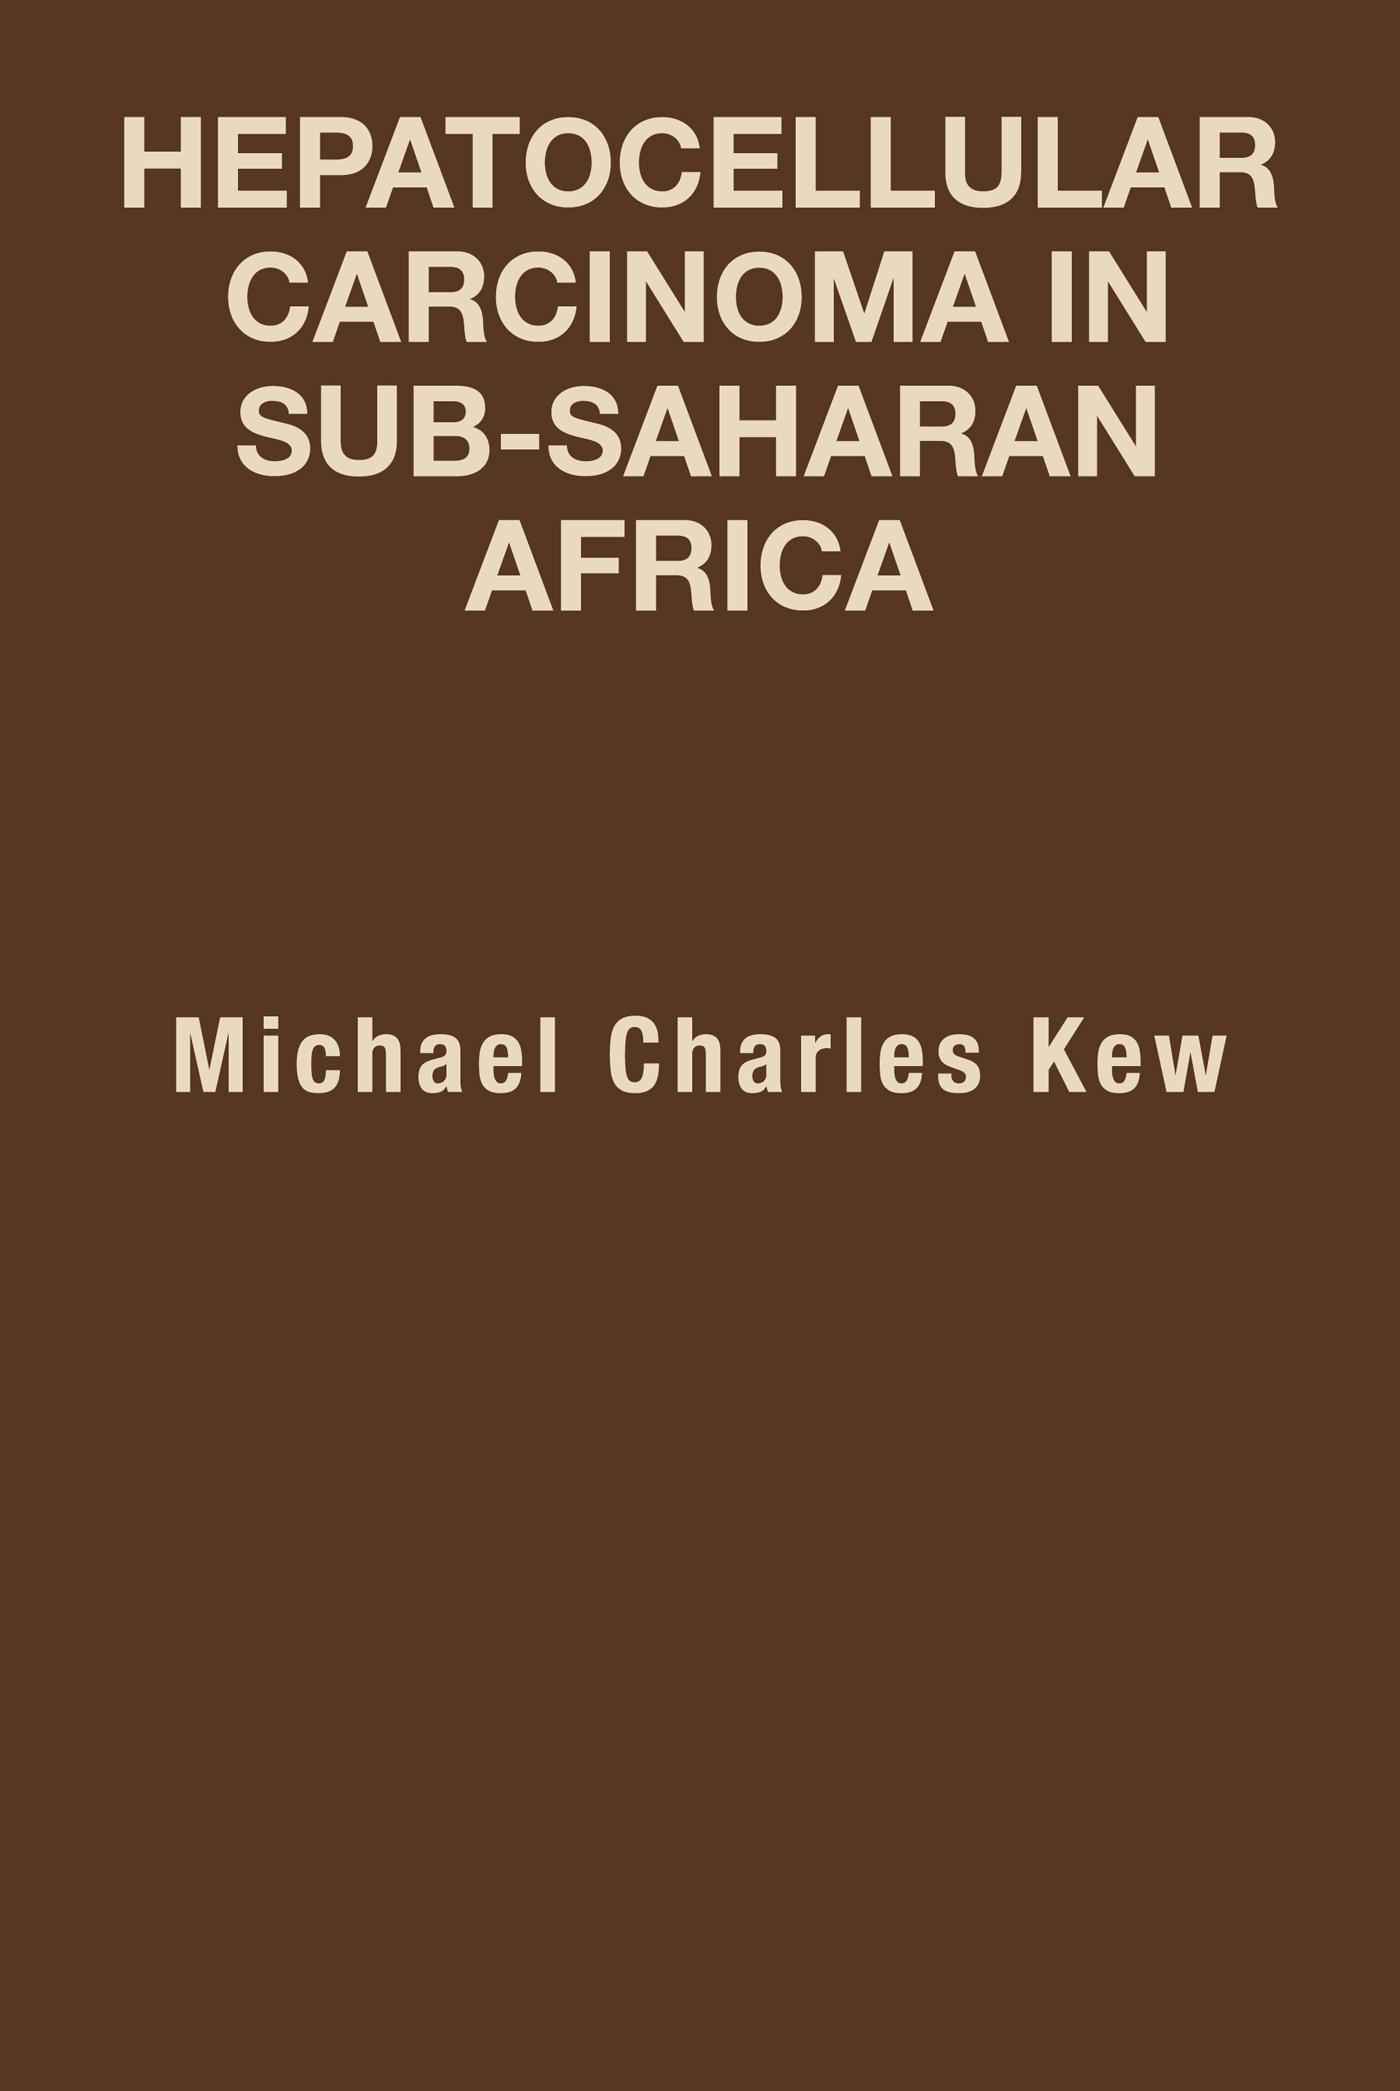 HEPATOCELLULAR CARCINOMA IN SUB-SAHARAN AFRICA EB9781466918887